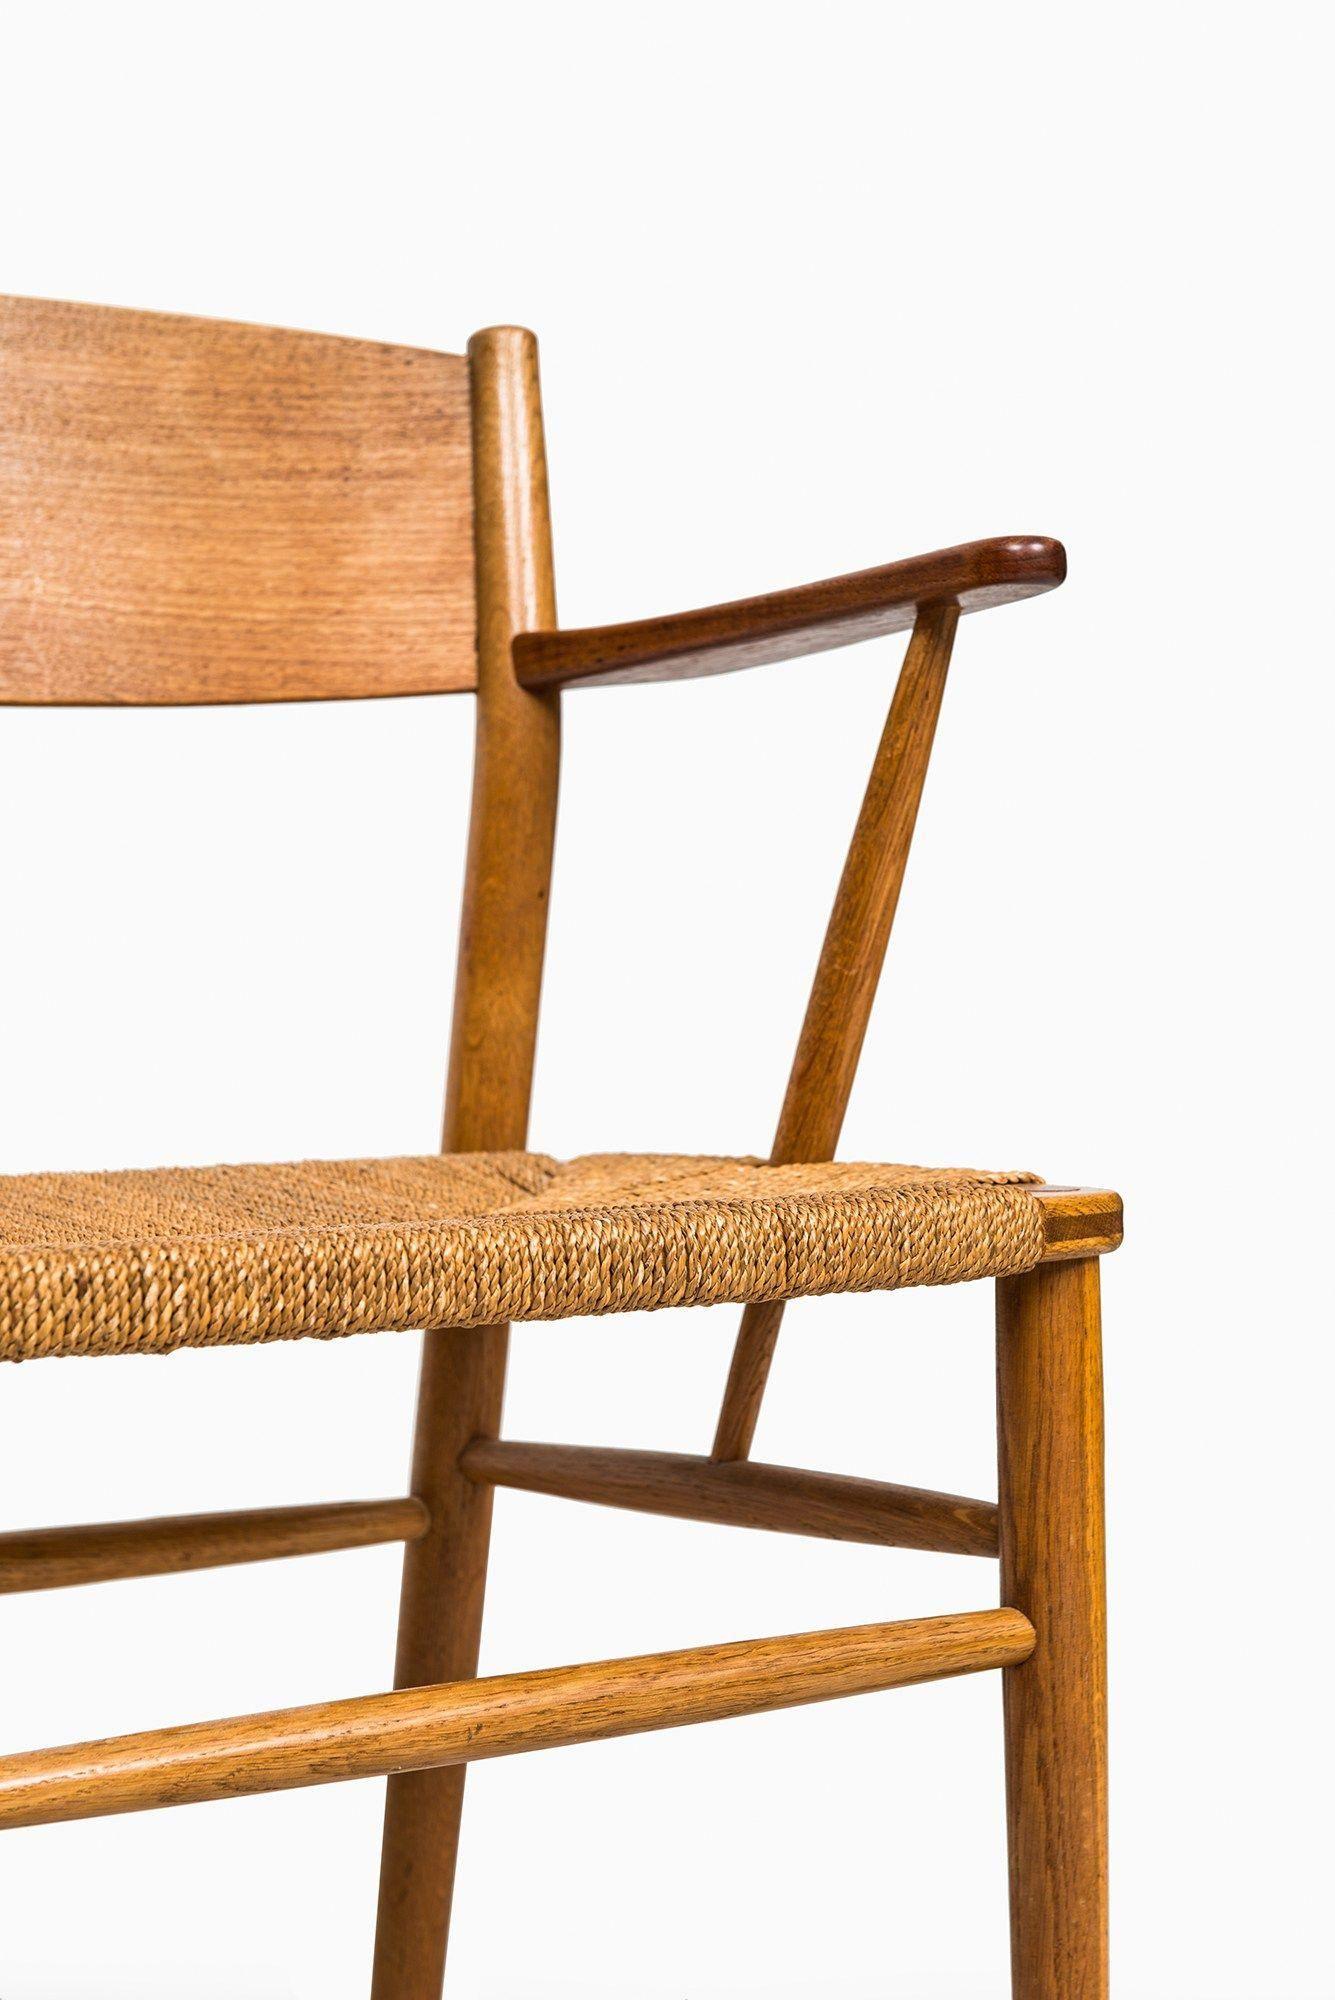 Herman Miller Chair Size C Chairshangfromceiling Girlsdeskchair